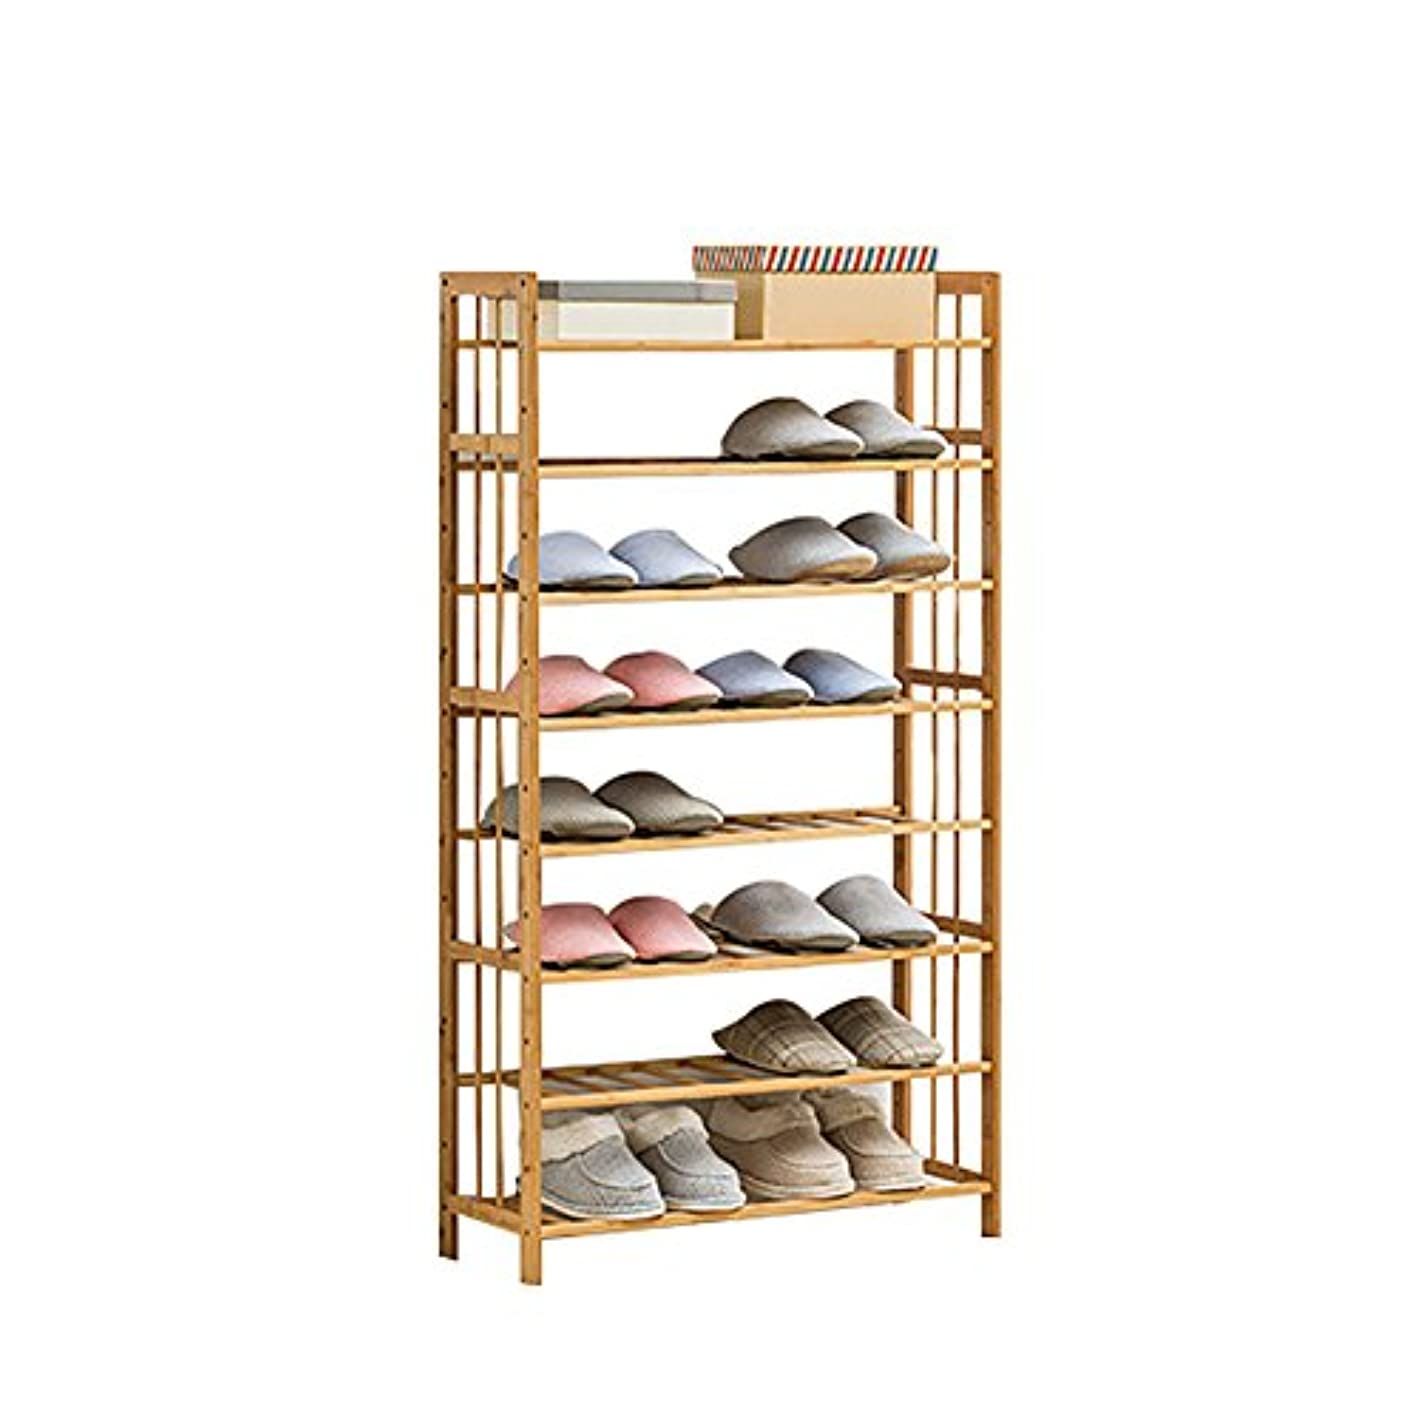 GX&XD 8-Tier Floor Bamboo Easy Shoe Rack,Assemble Dust-Proof Shoe Tower Stackable Shoe Organizer Shelves Holds 20-25 Pair of Shoes Unit entryway Shelf-A 70x25x125cm(28x10x49)